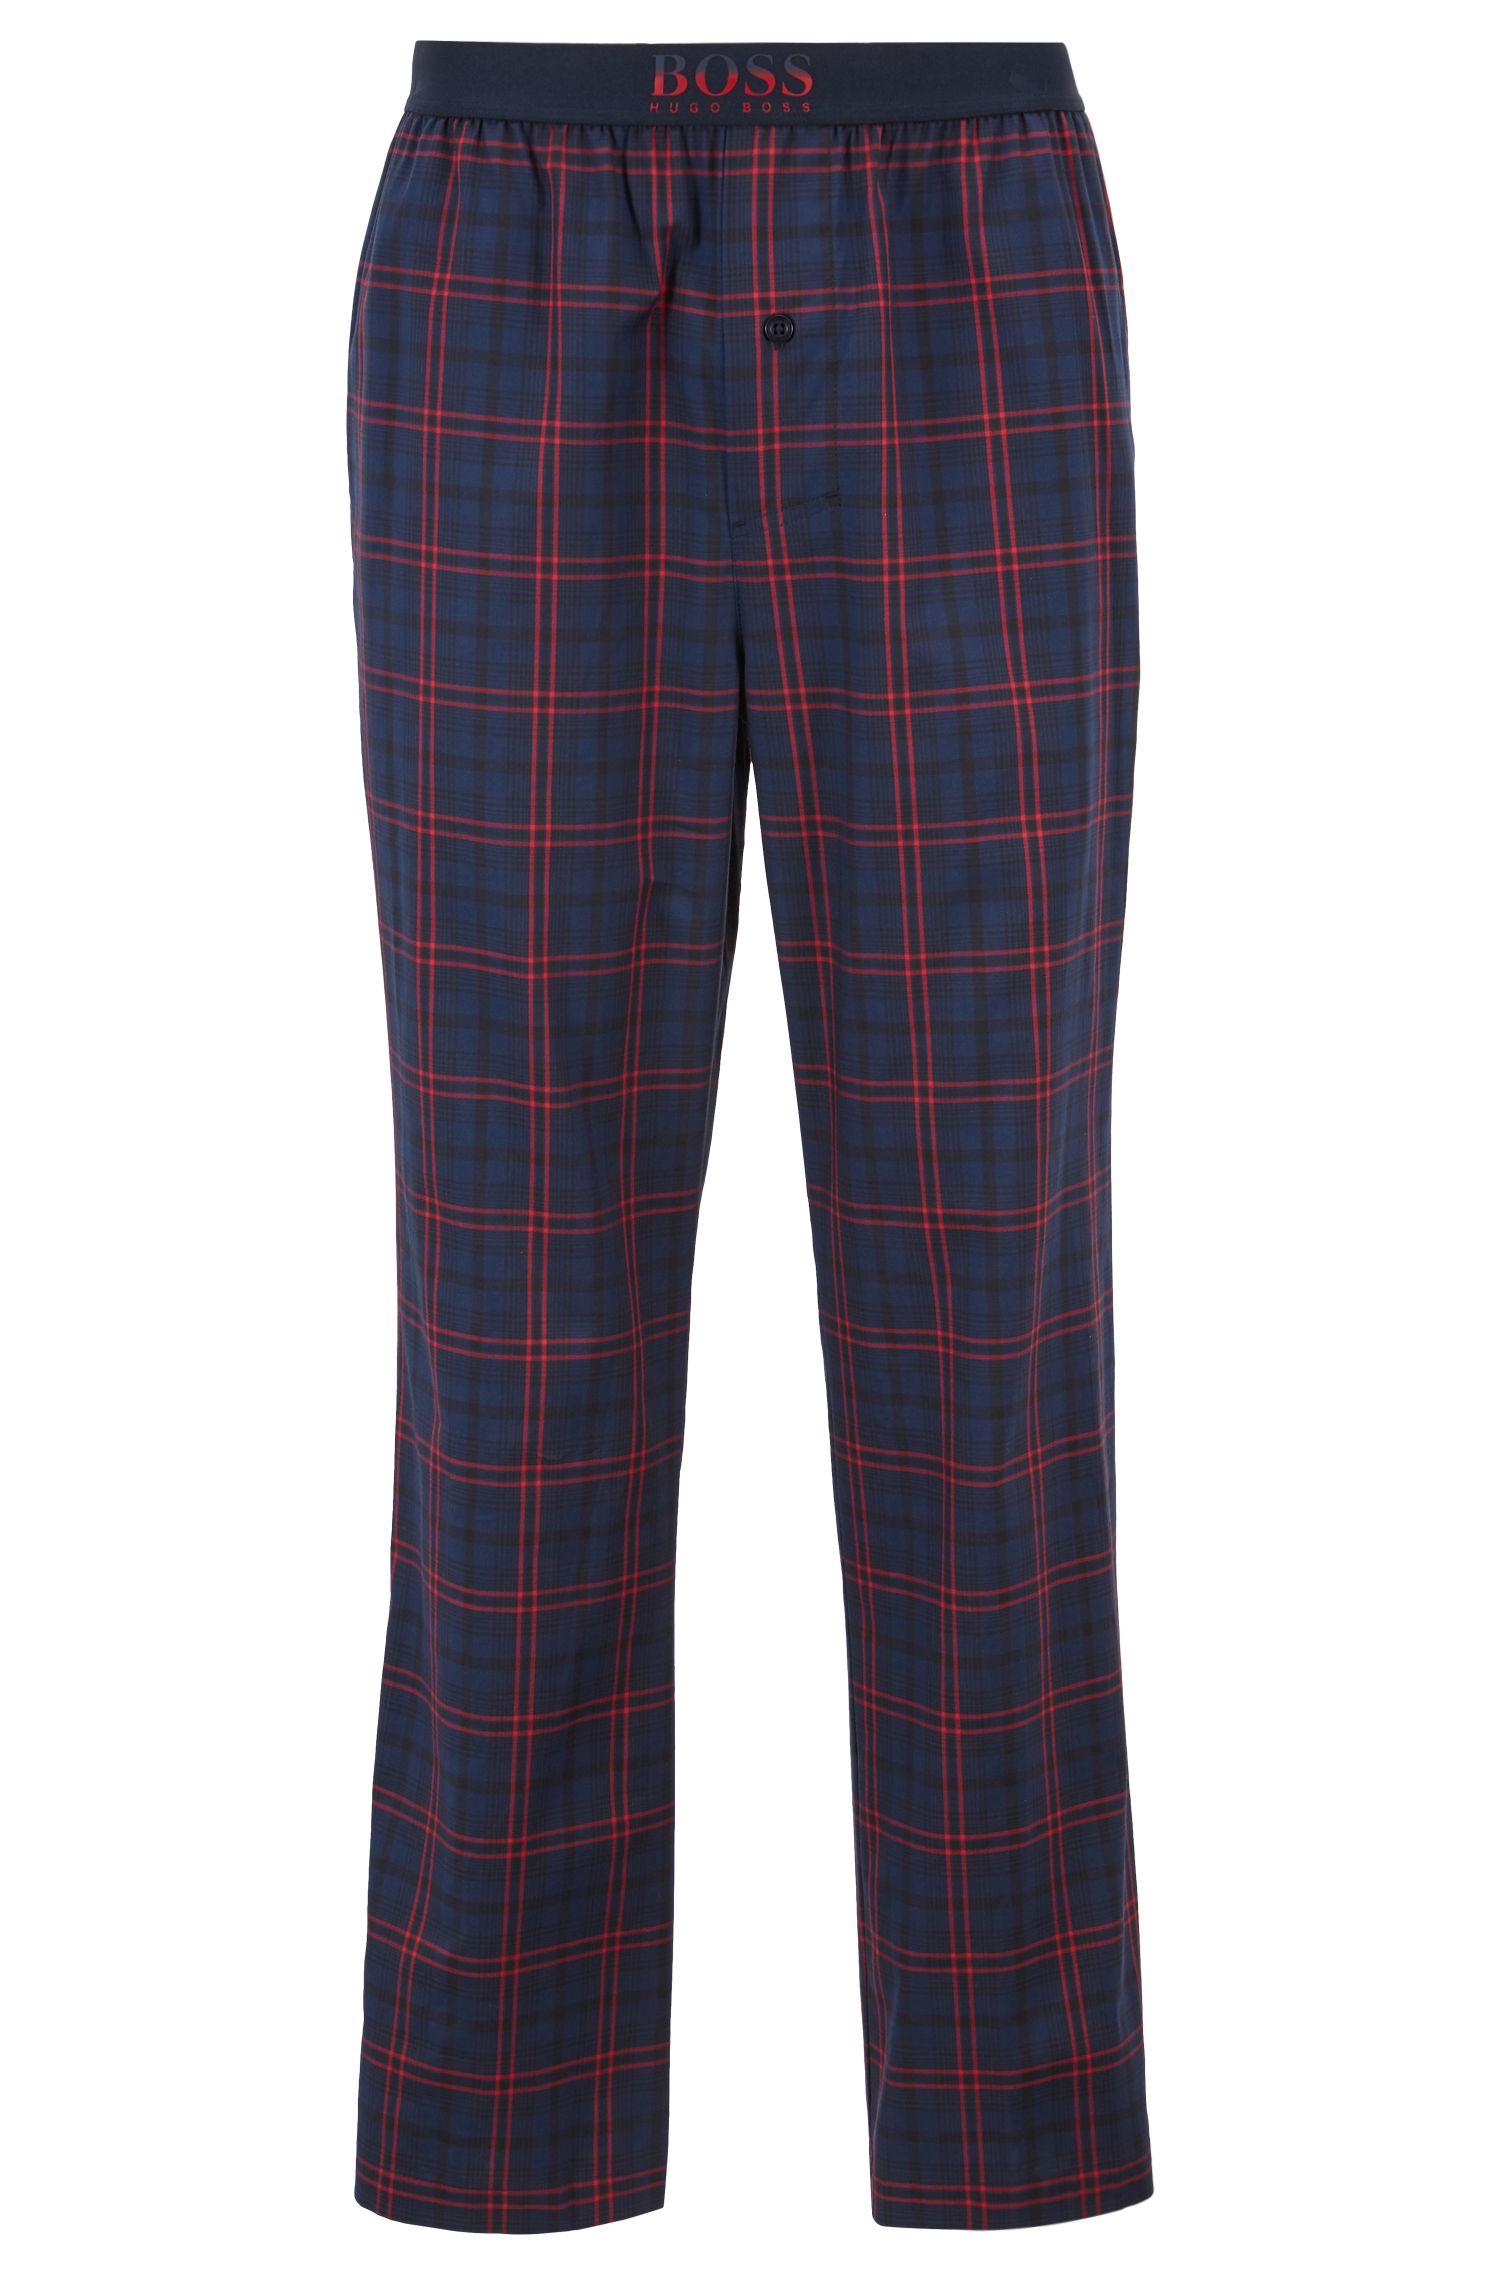 Pantalones de pijama en sarga de algodón a cuadros, Azul oscuro